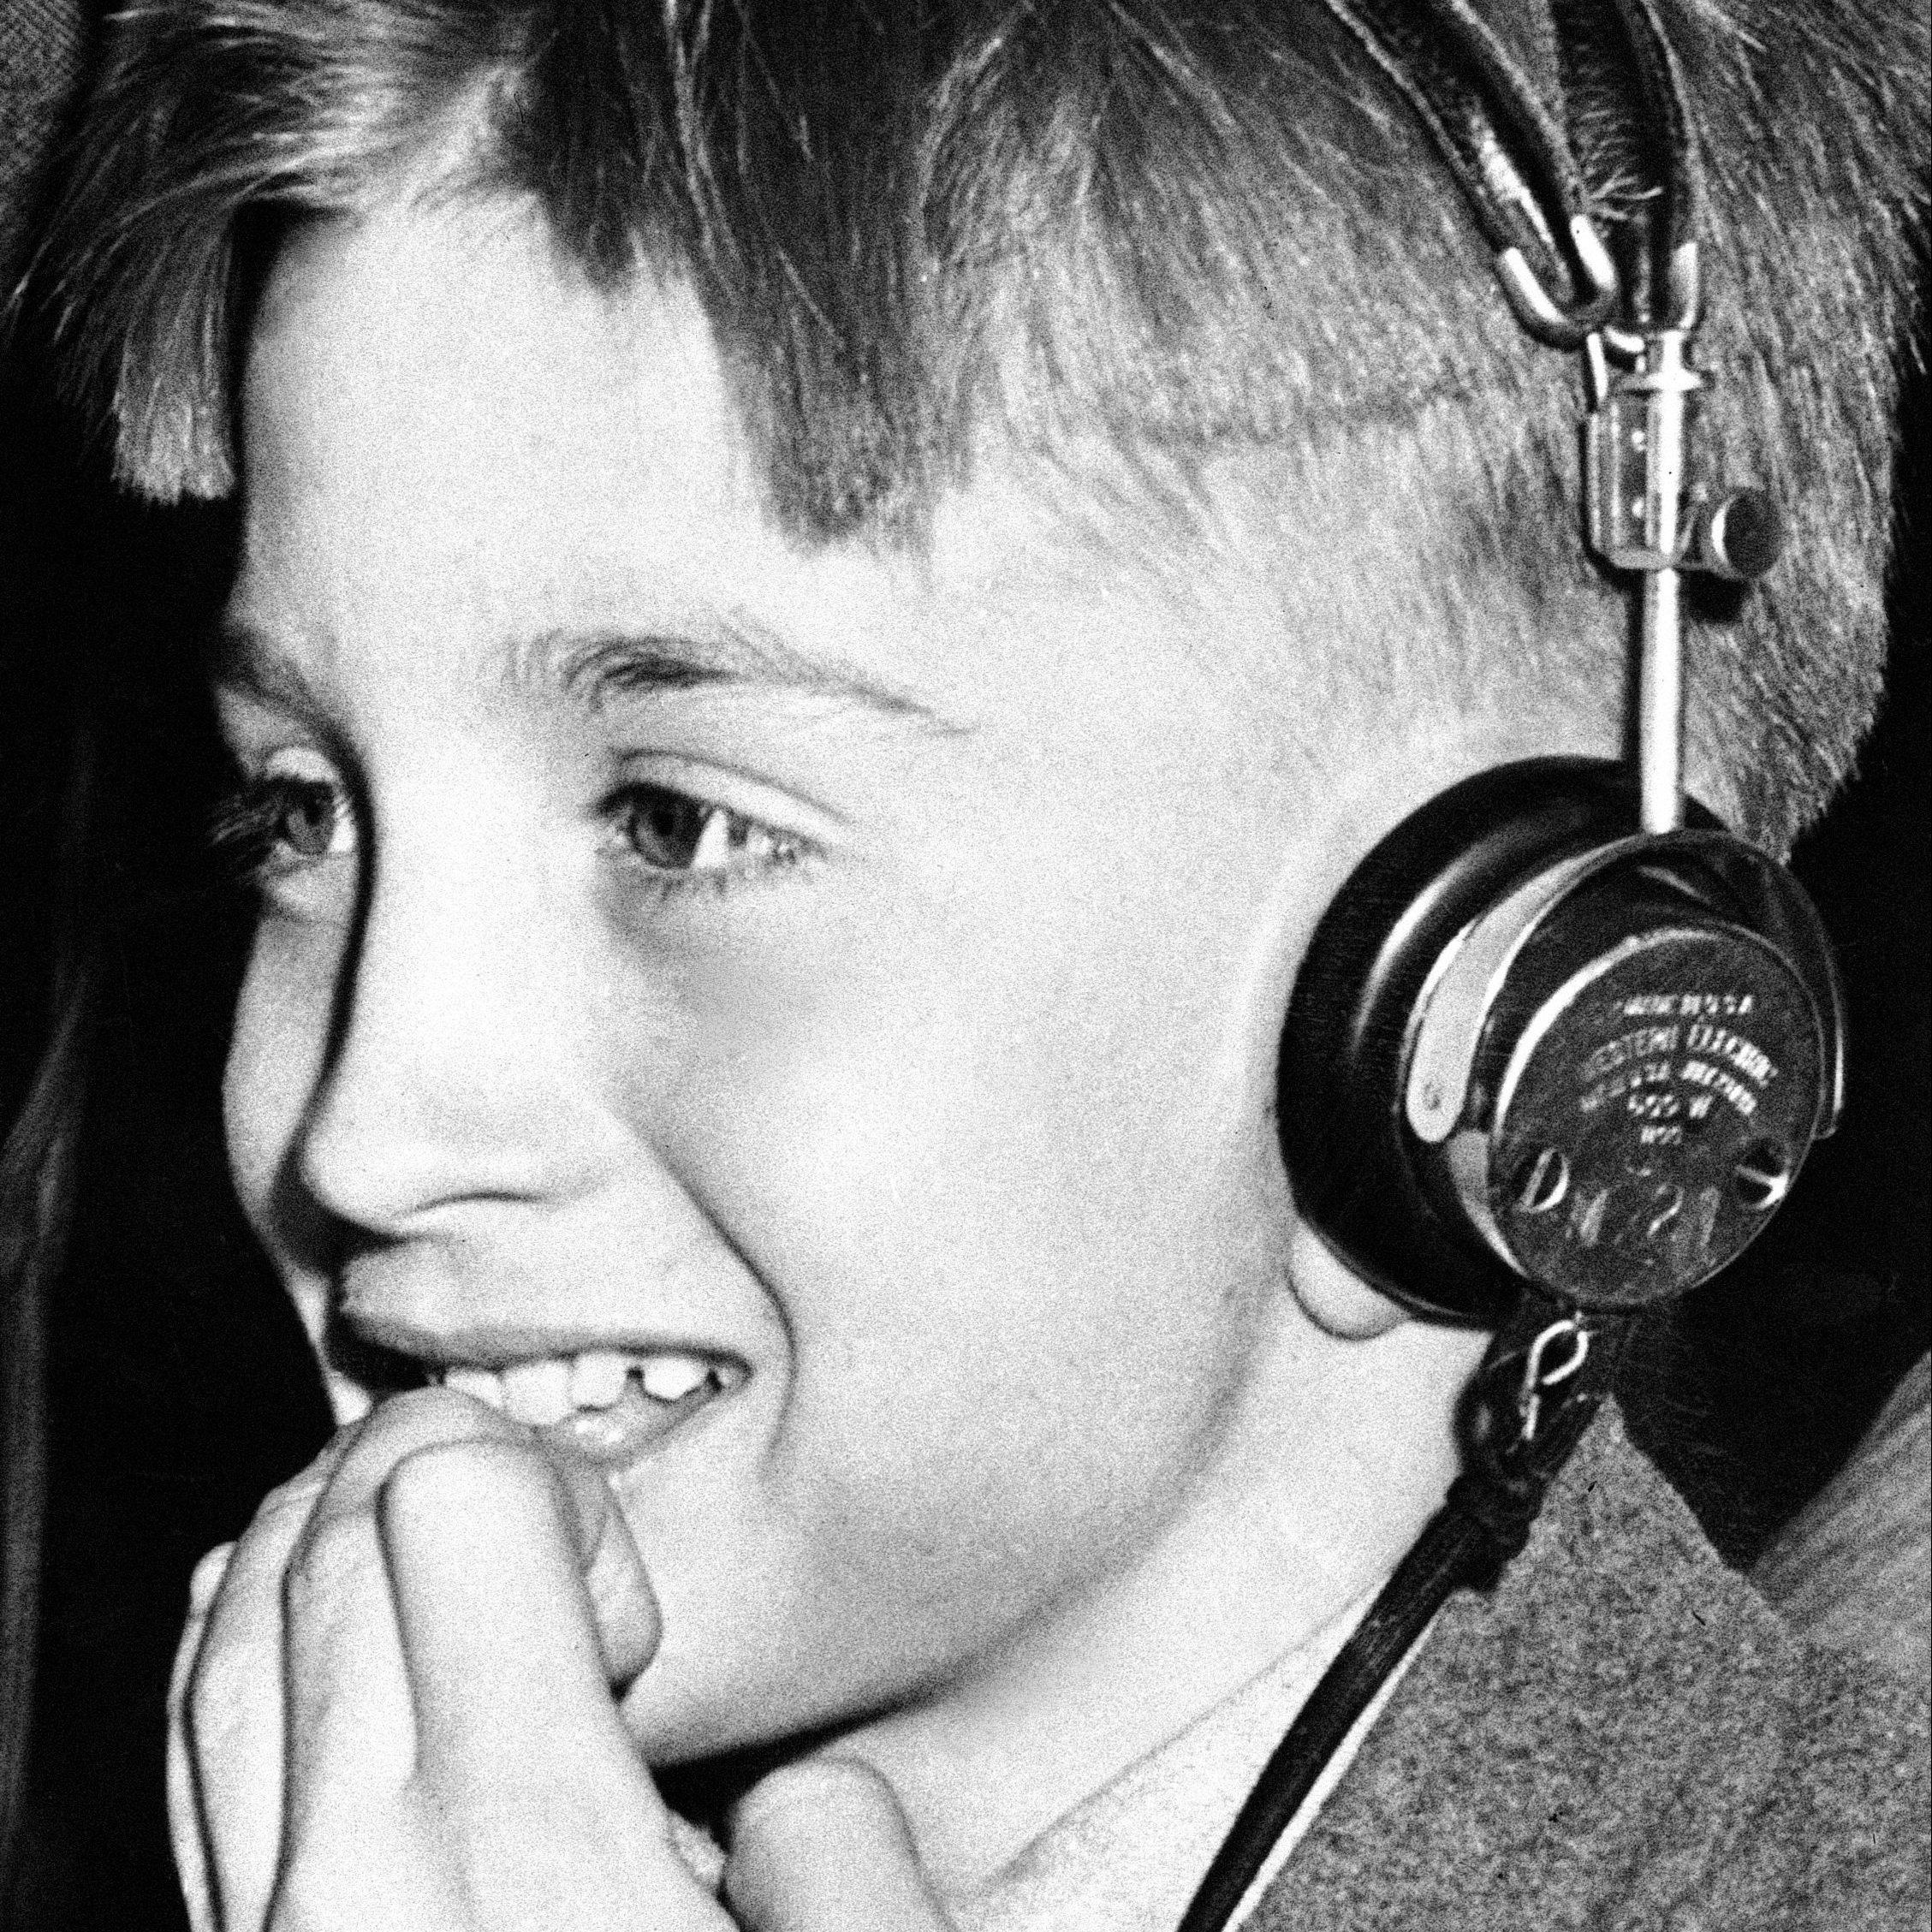 A boy wearing headphones.